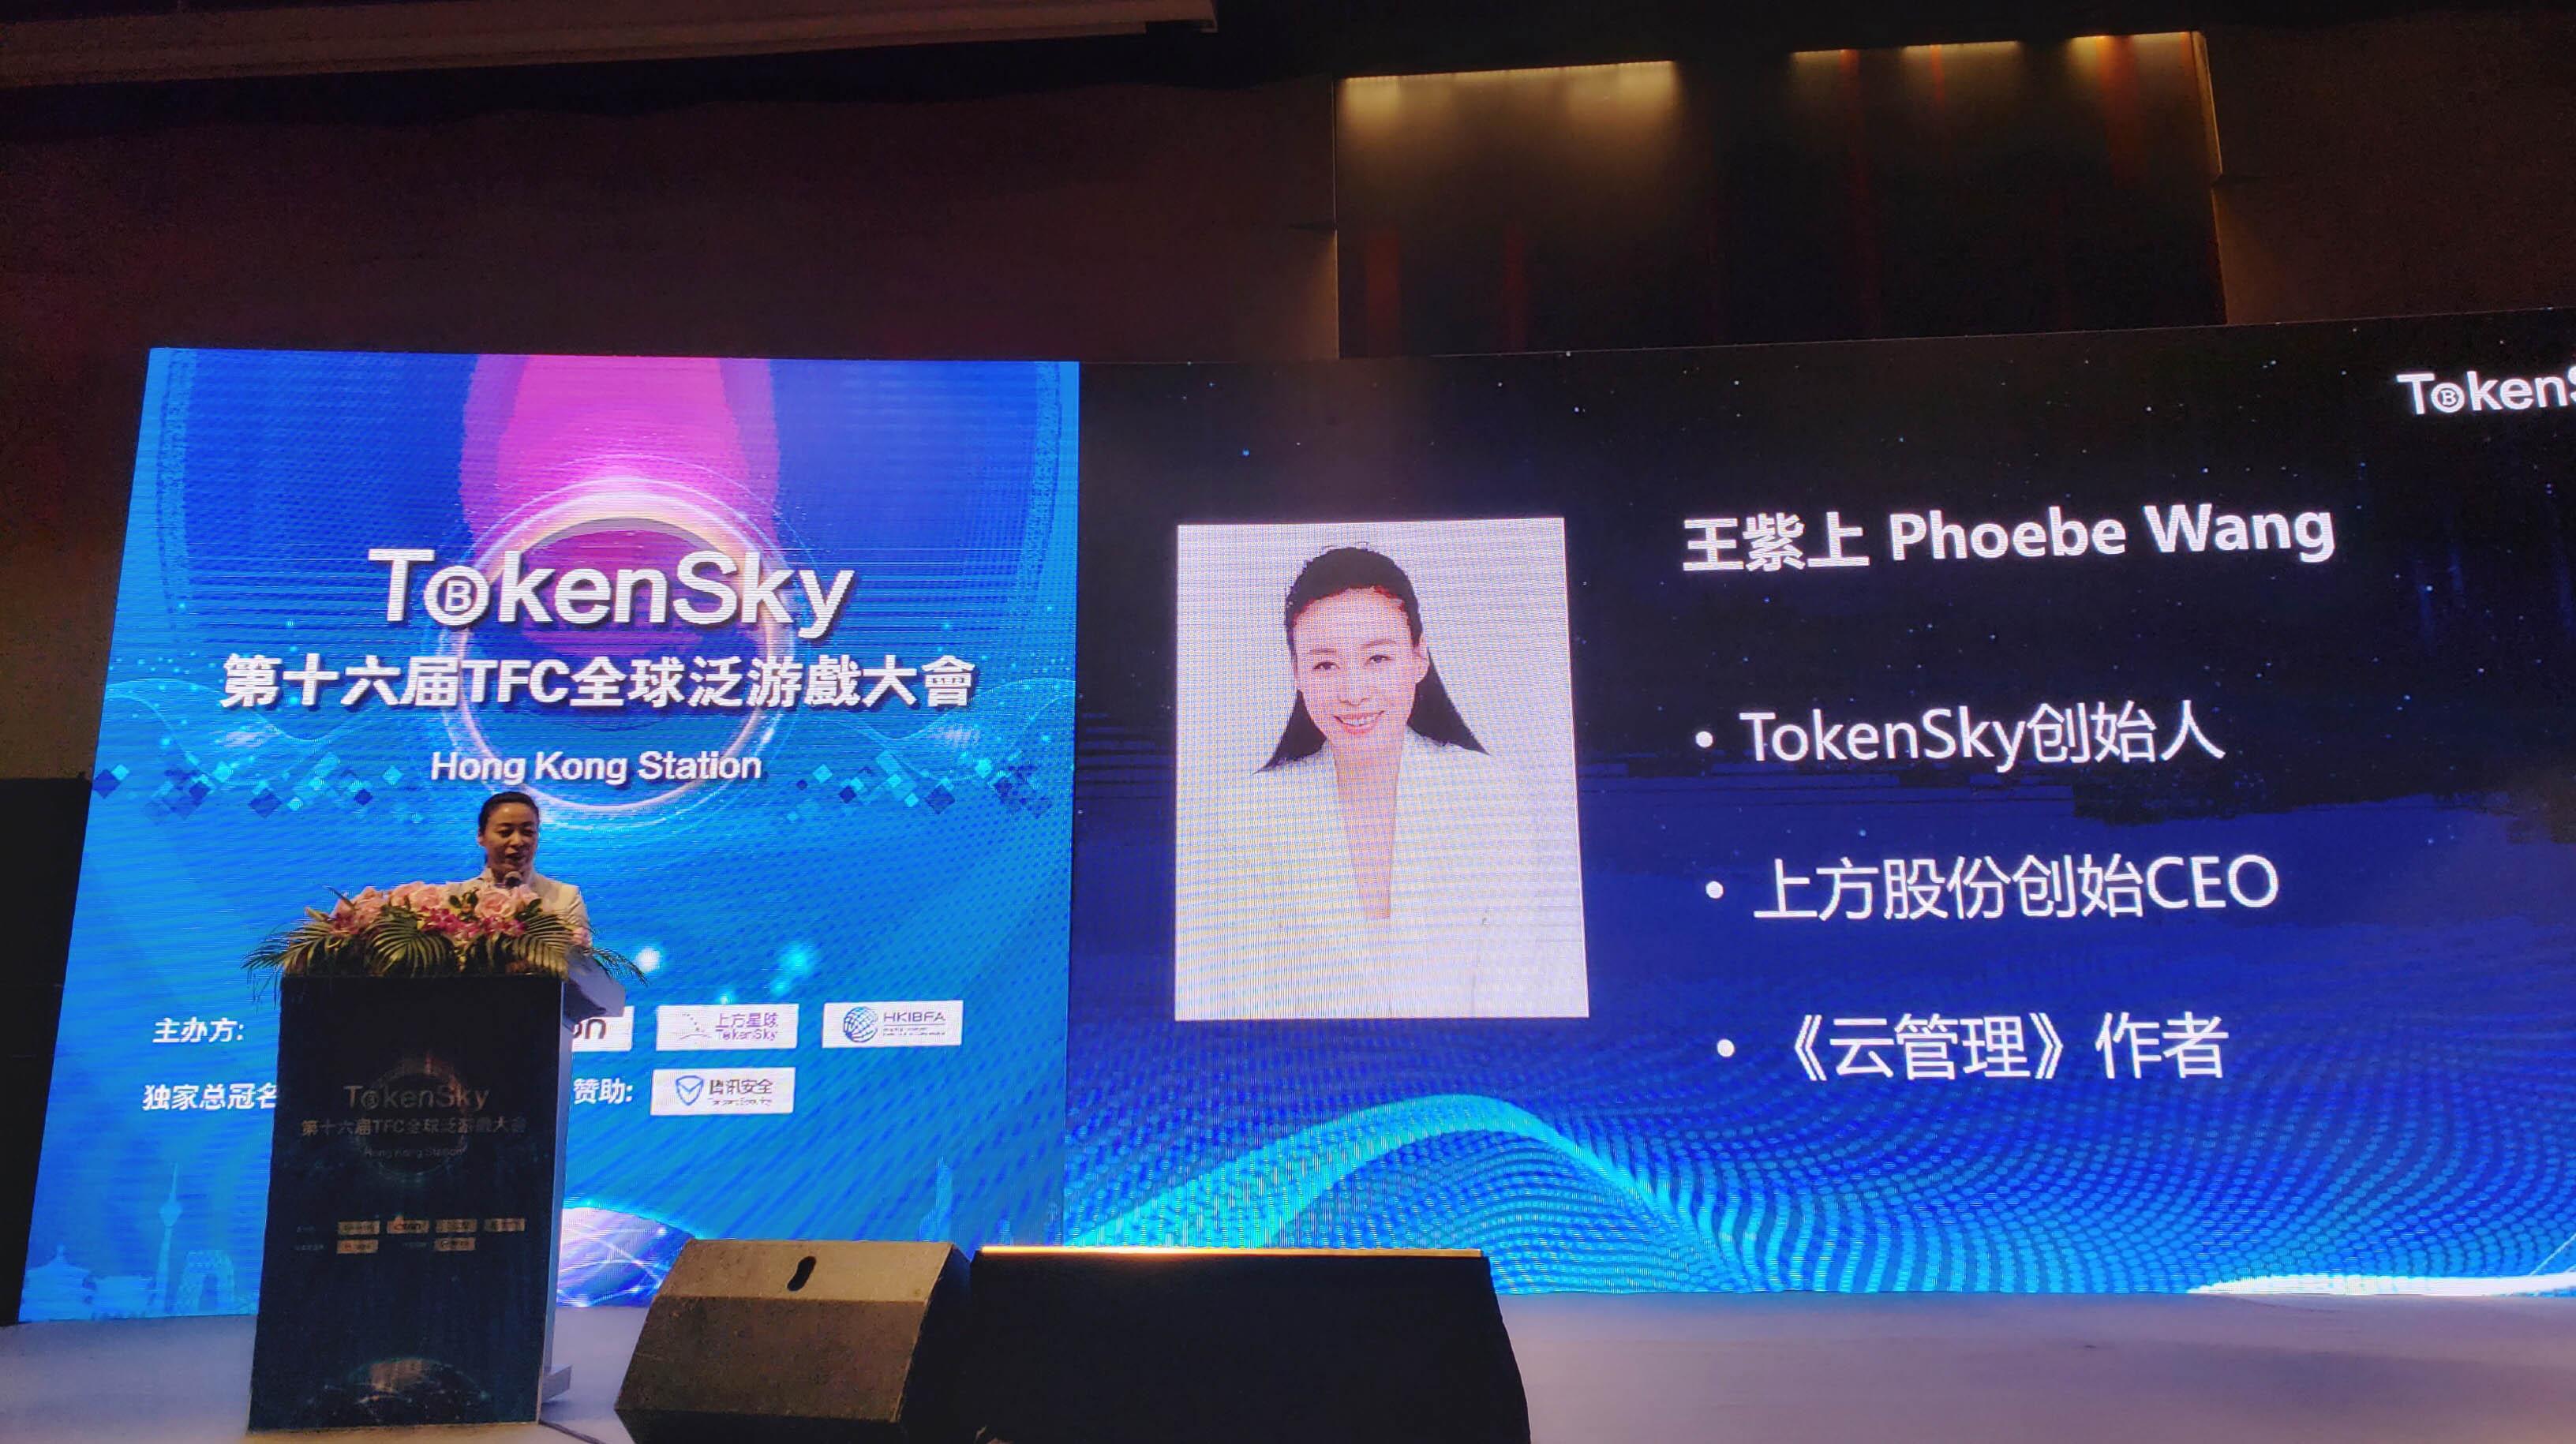 TokenSky香港站开幕式王紫上致辞:帮千家手游团队移民链游新世界